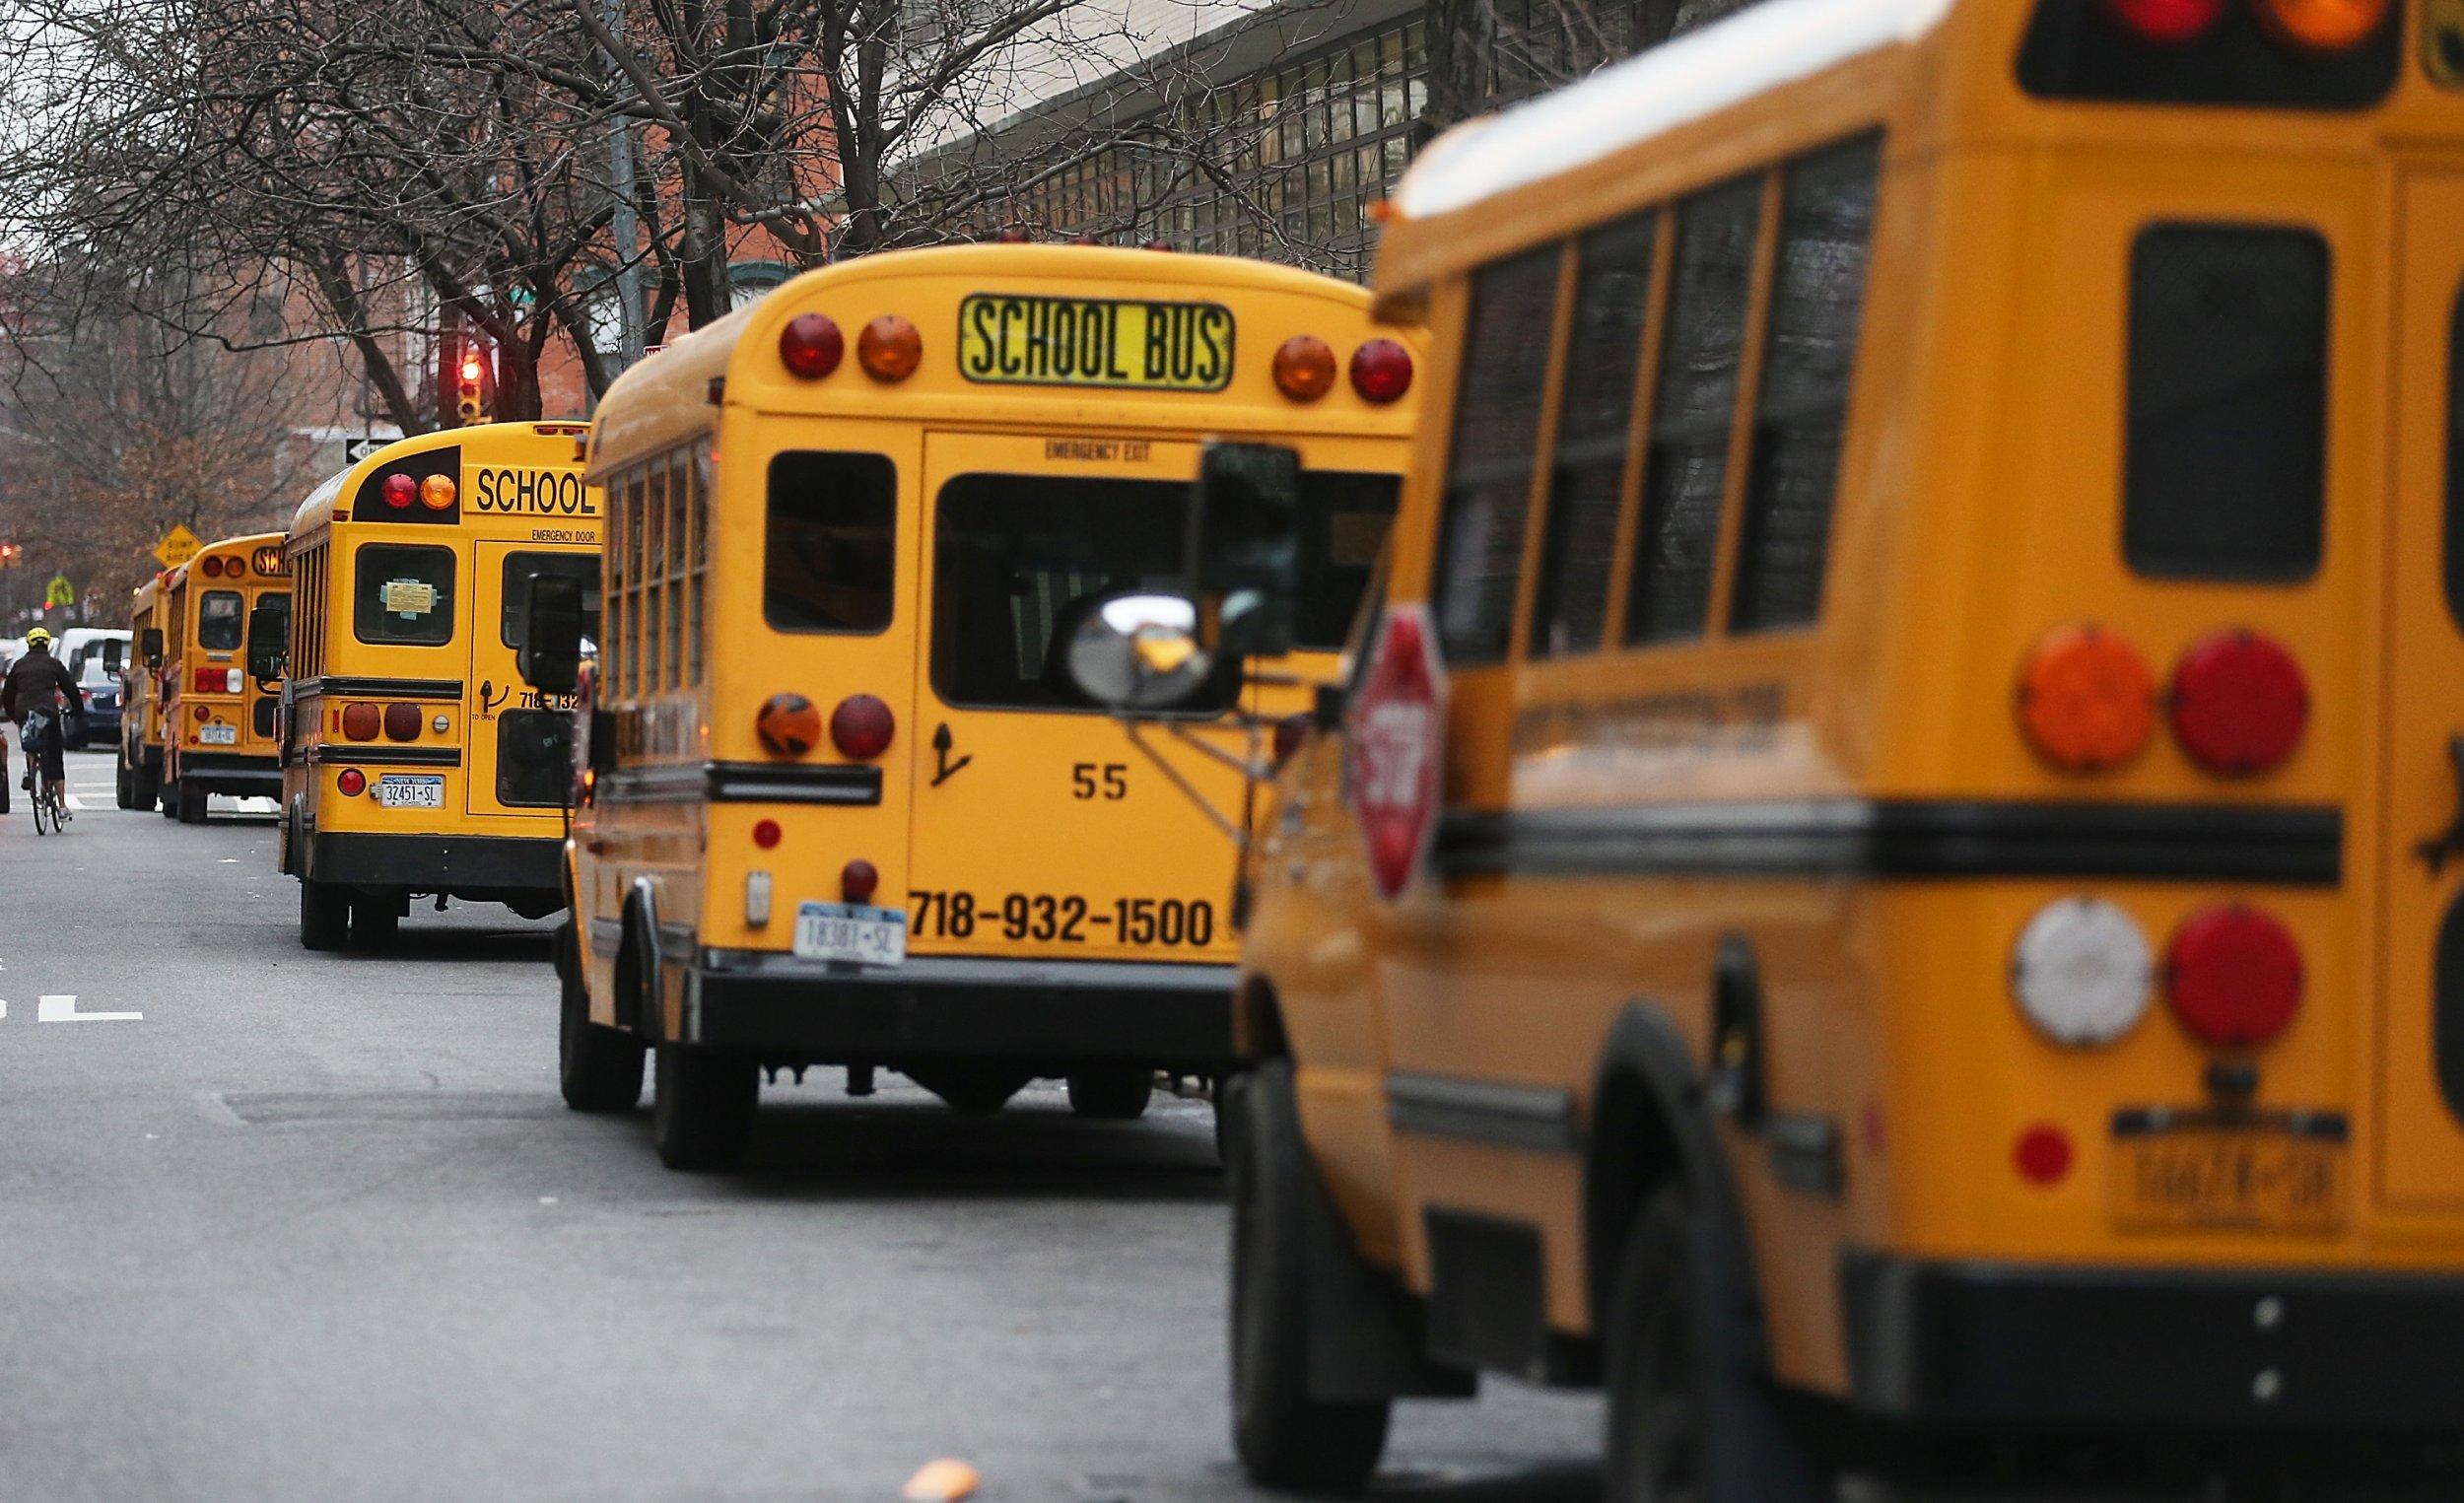 School bus, Facebook, viral video, ohio, bullying